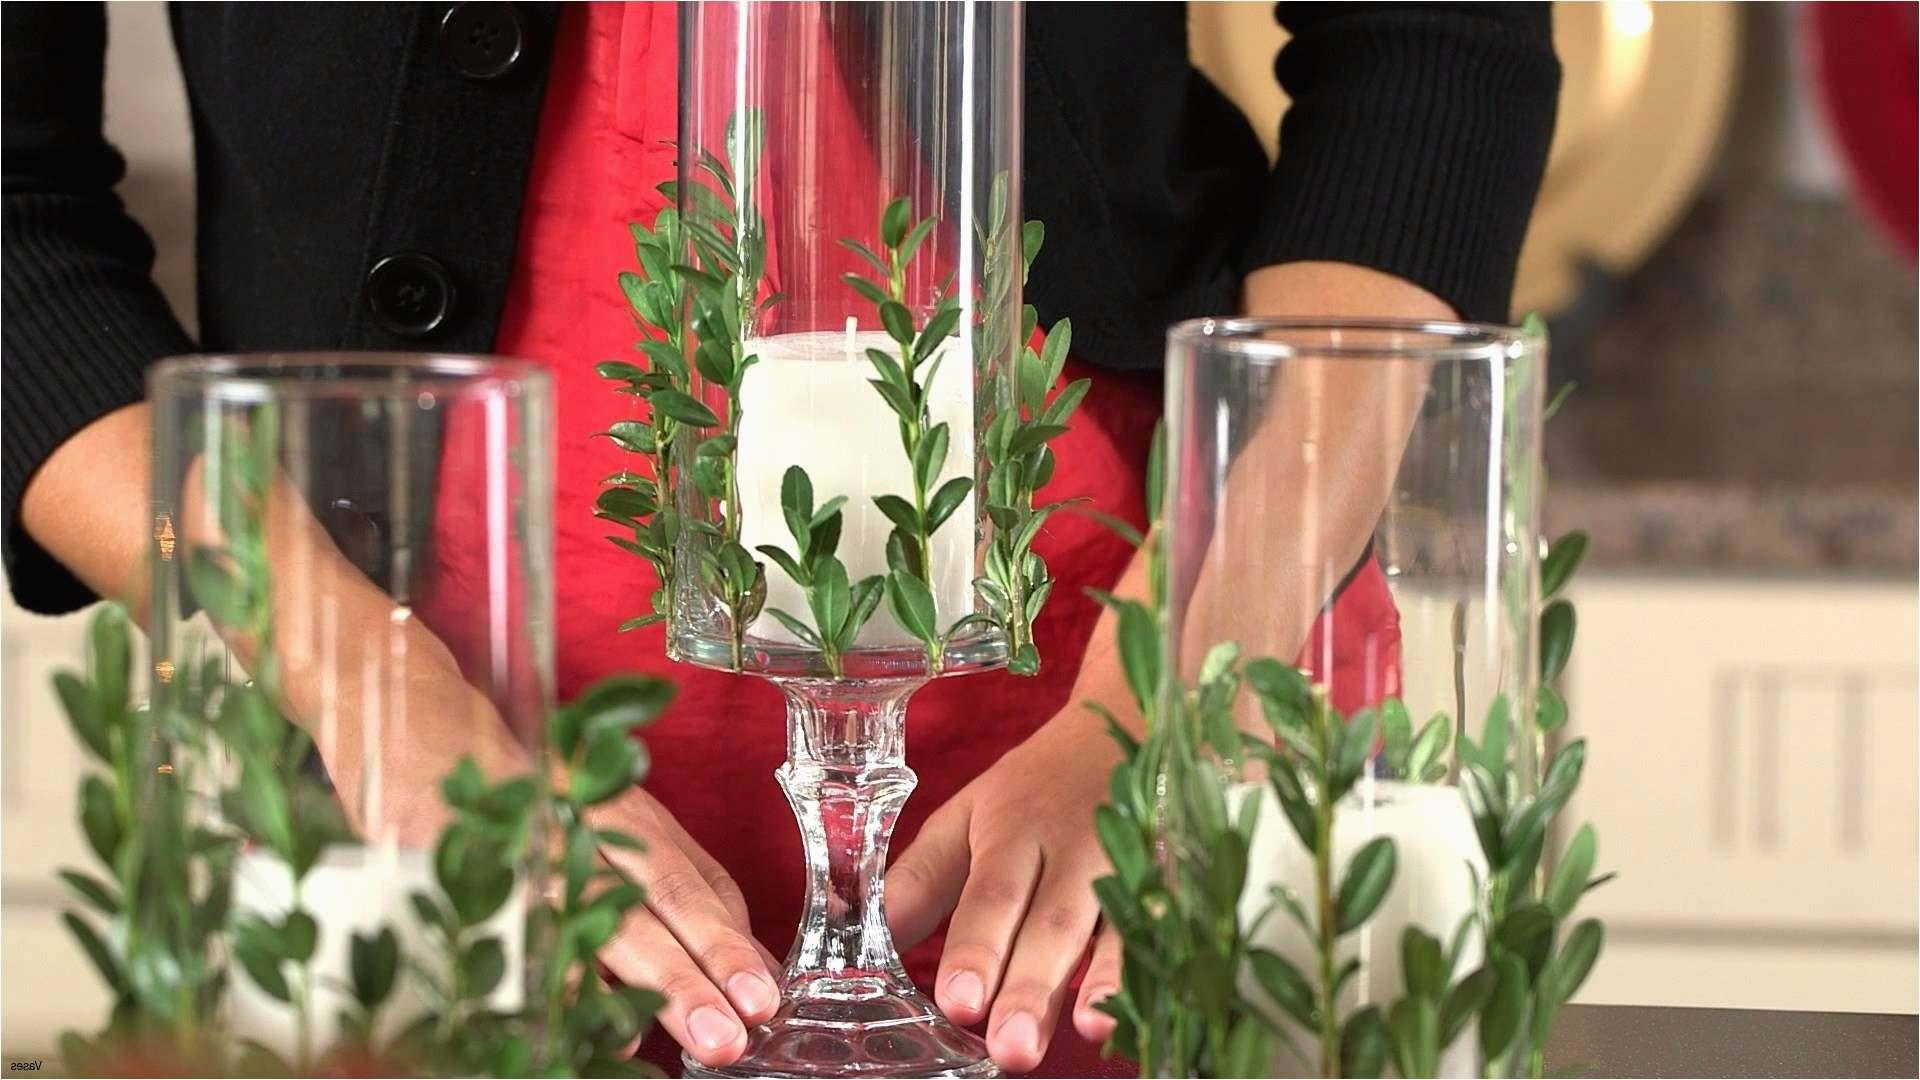 black wedding vases of tree decorations style dollar tree wedding decorations awesome h regarding tree decorations 2018 dollar tree wedding decorations awesome h vases dollar vase i 0d gallery